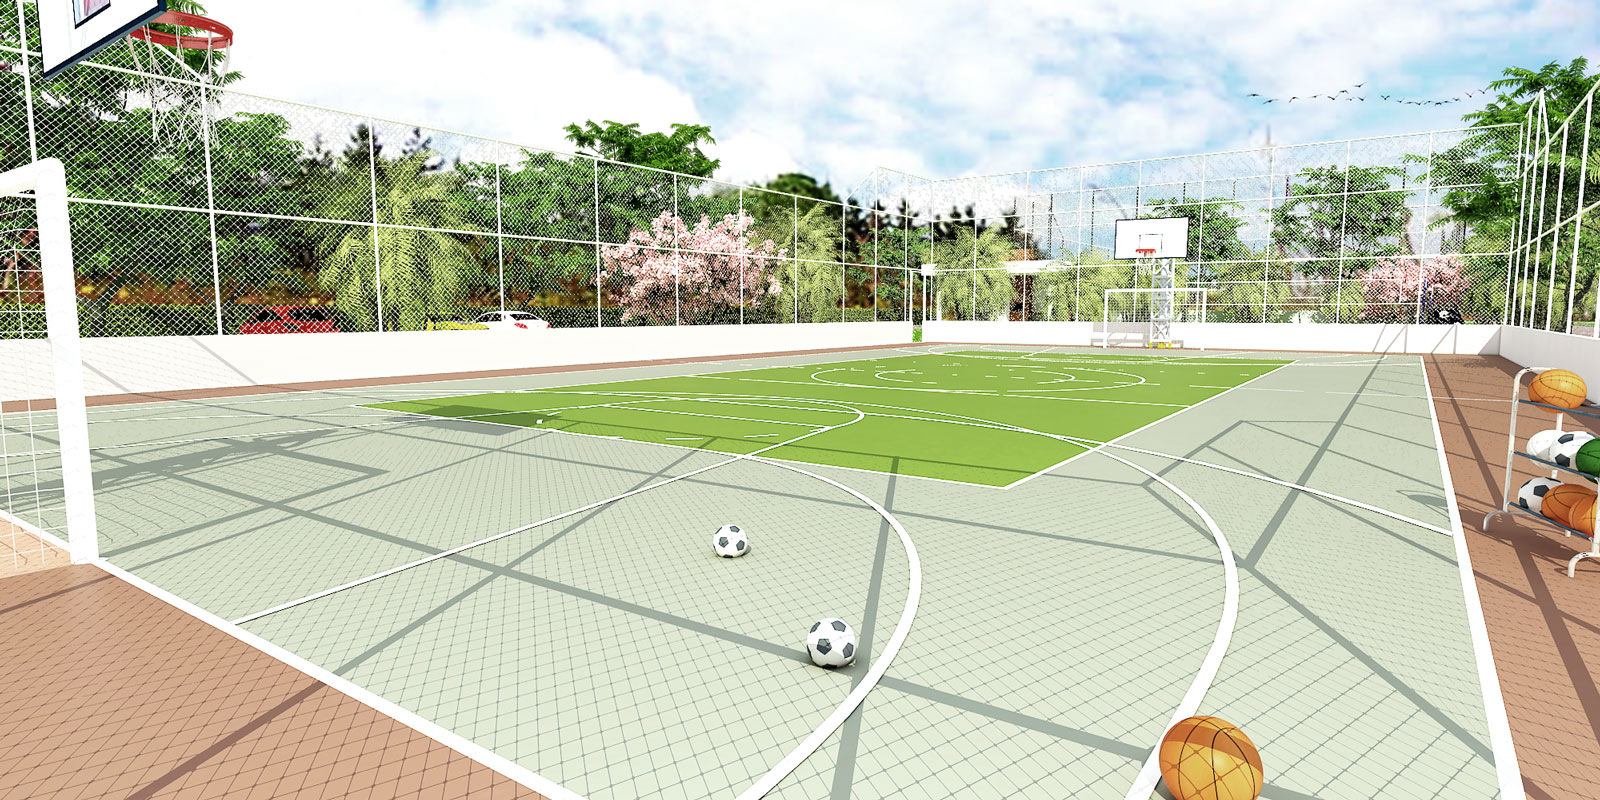 Perspectiva-Ilustrativa-quadra-poliesportiva-Royal-Garden-Marica-RJ